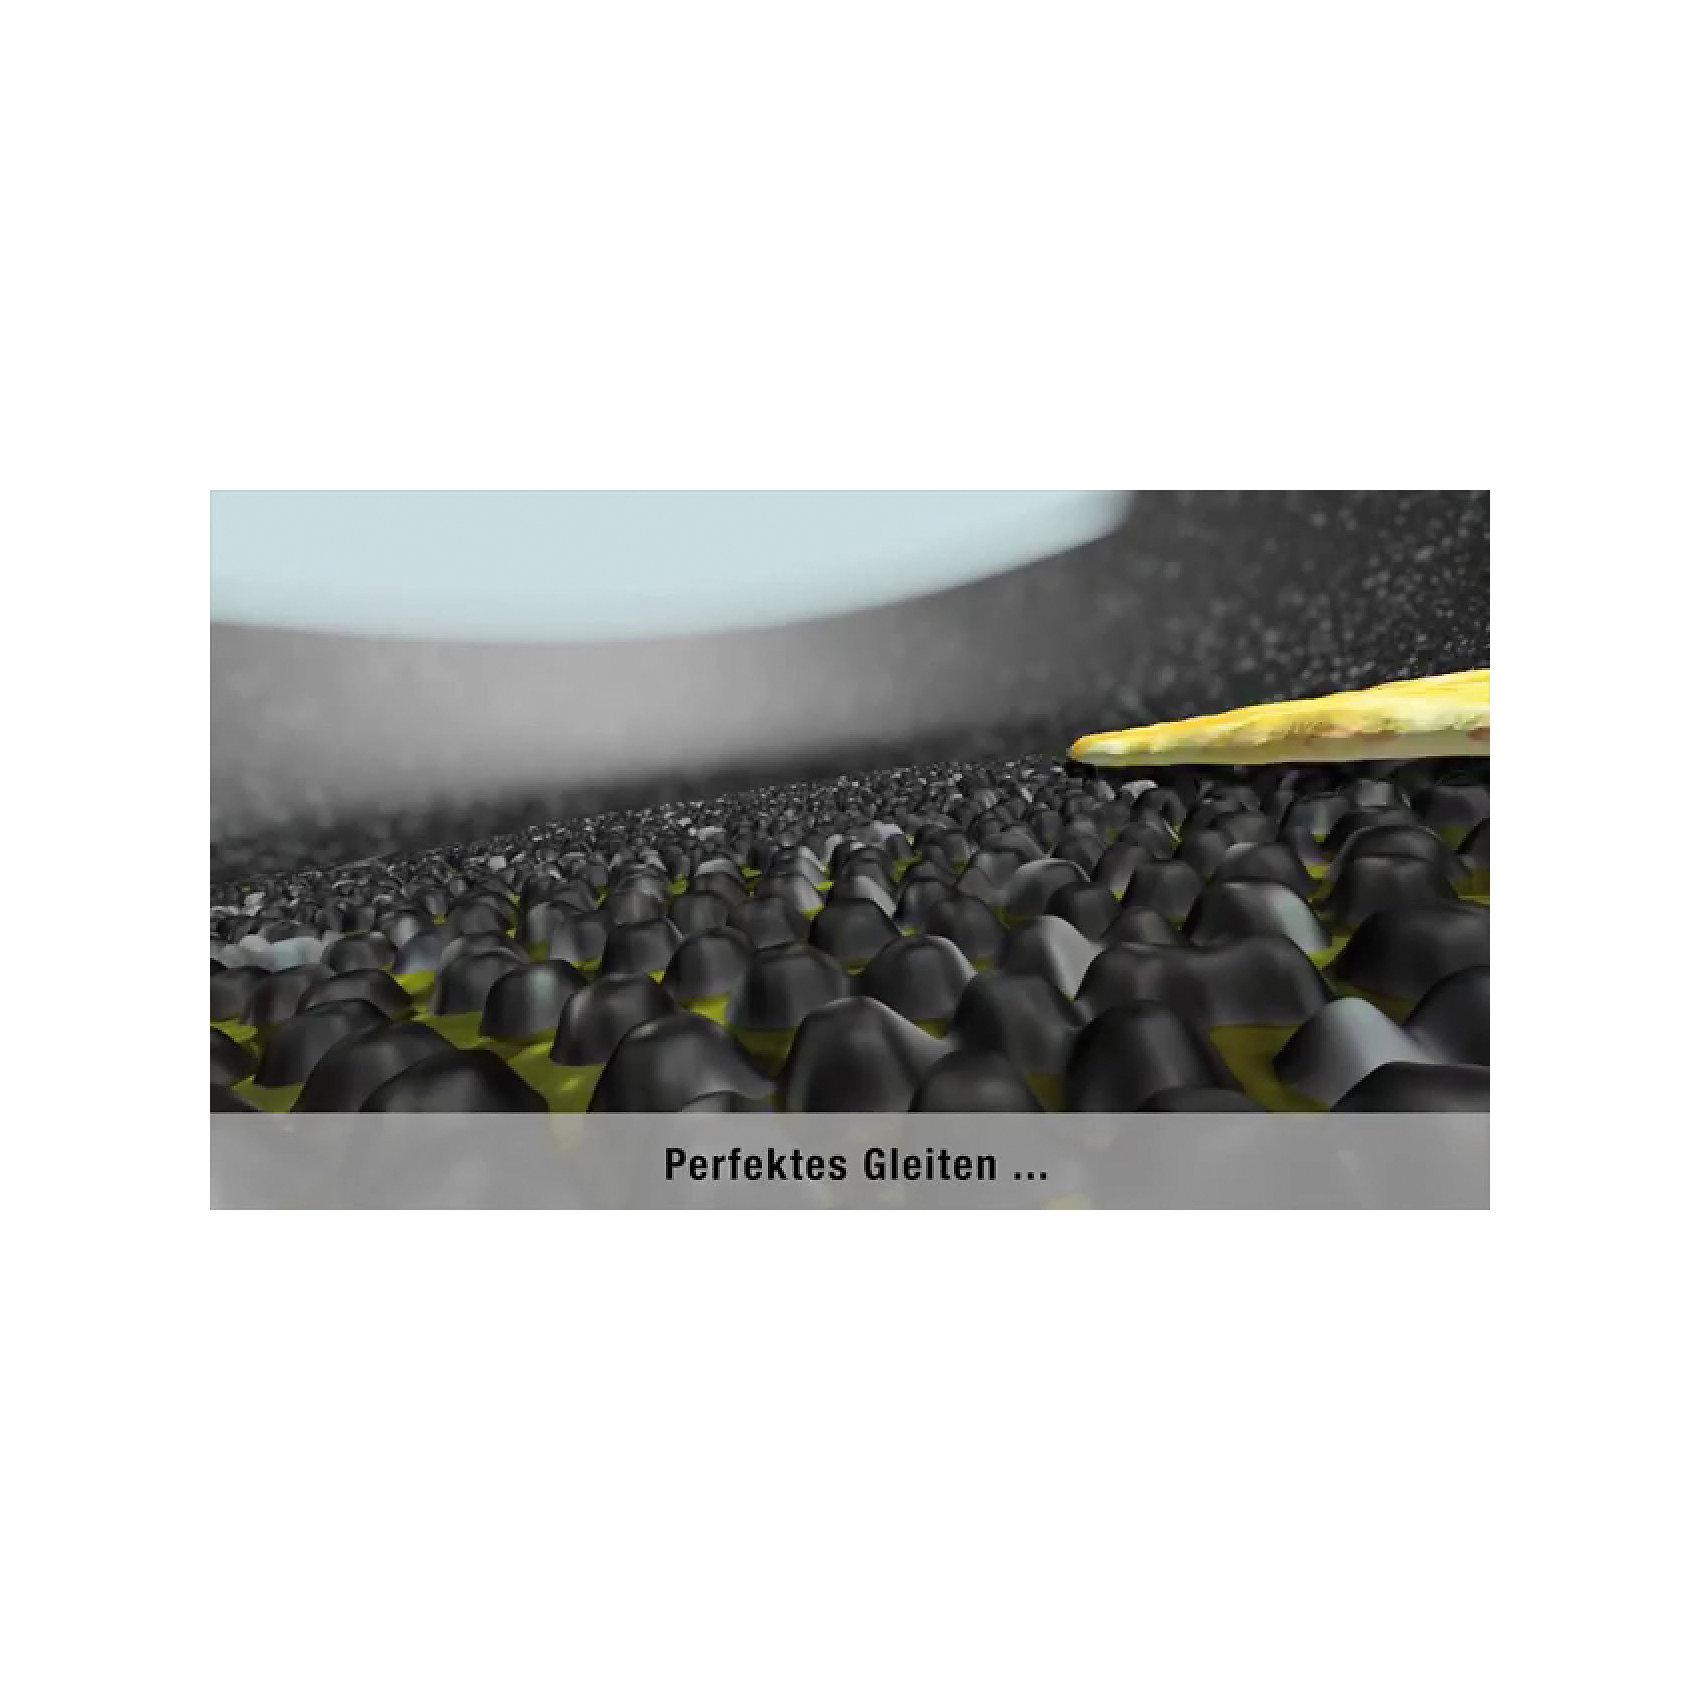 Neu ELO Schwere Aluguss Pfanne  Granit Evolution Evolution Evolution  Ø28 cm 7189115 42f665